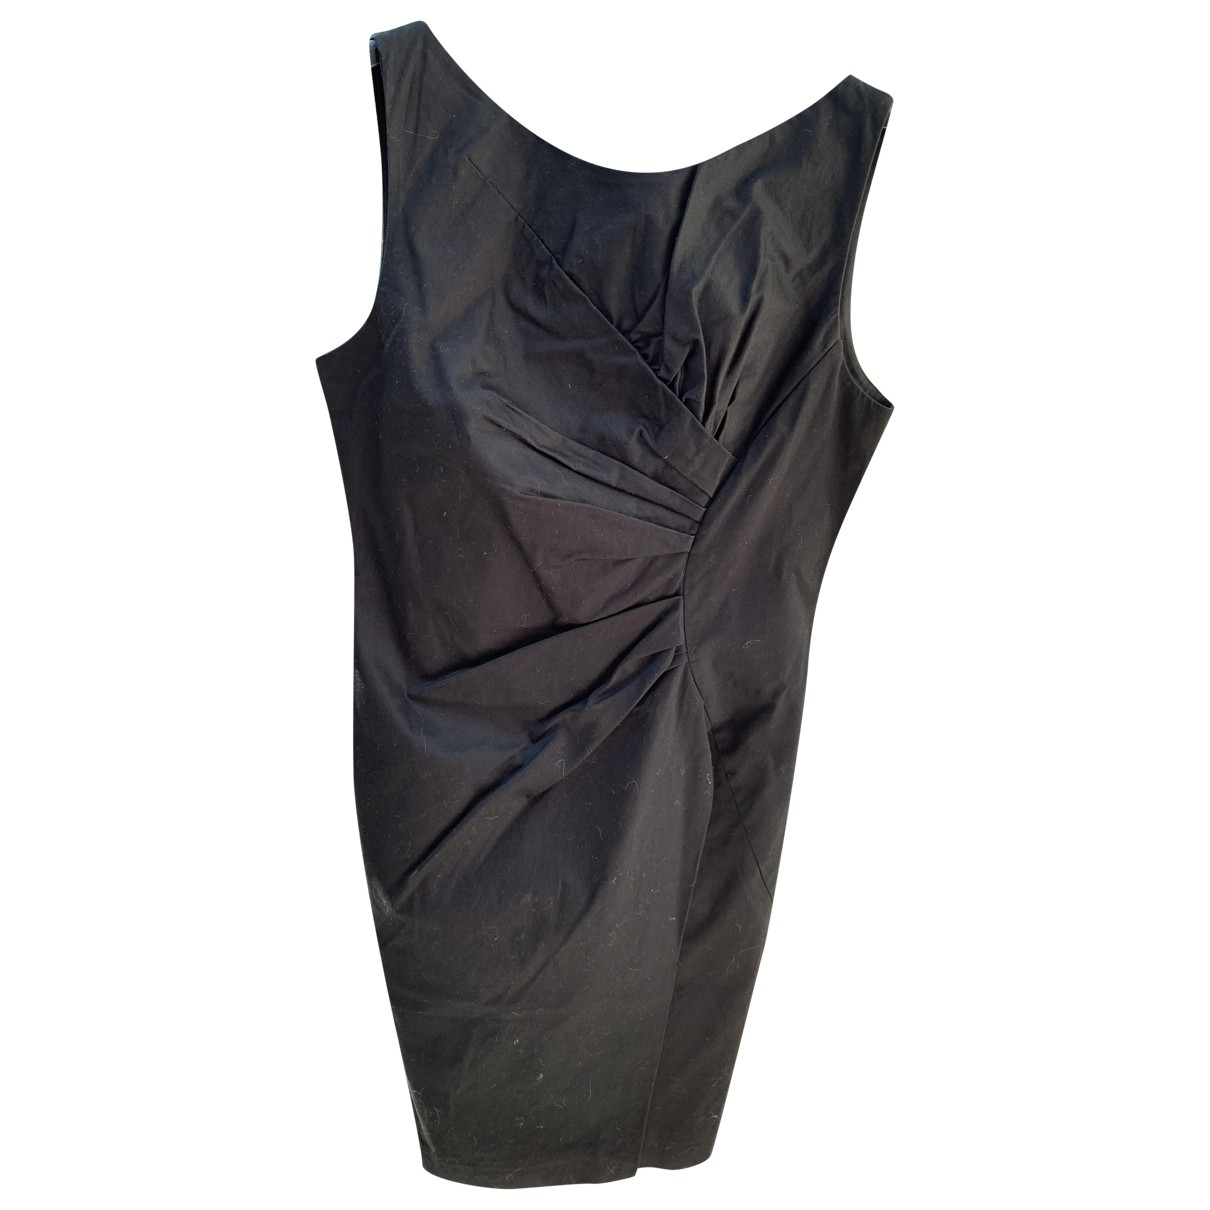 Hoss Intropia - Robe   pour femme en coton - elasthane - noir